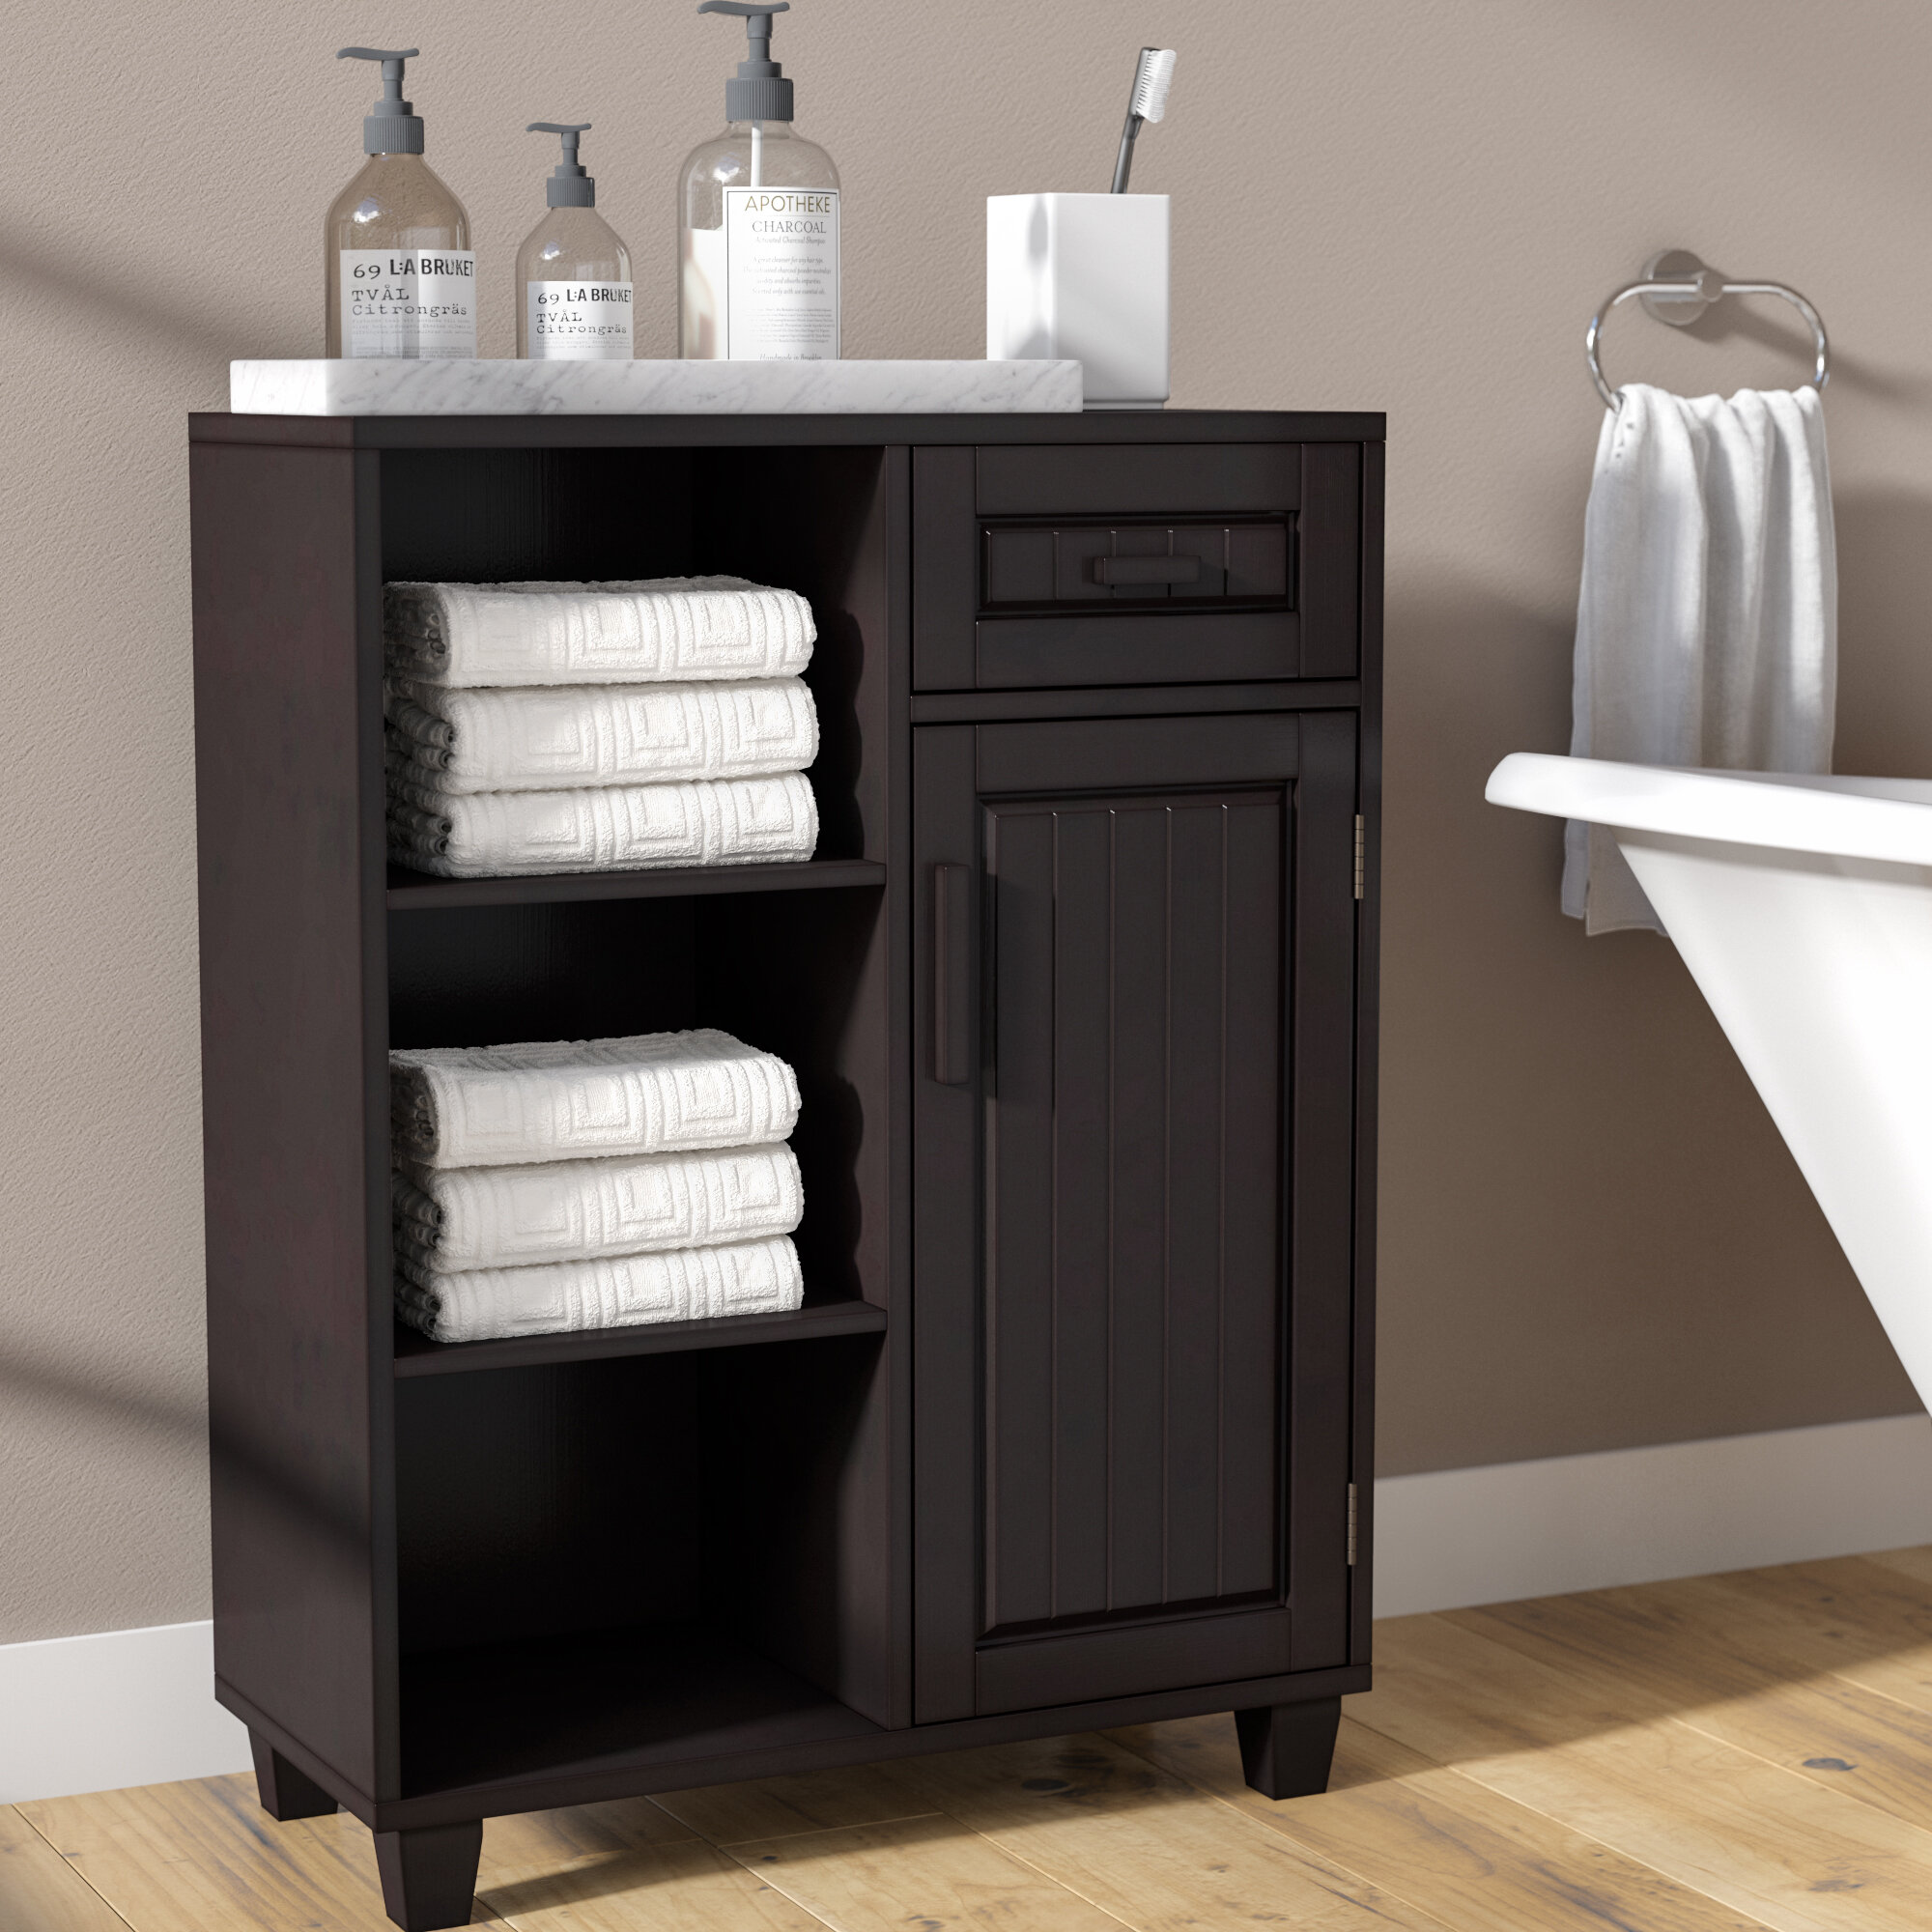 ideas vanities and in custom shelf steam images medicine built cabinets online closet cabinet bathroom shelves